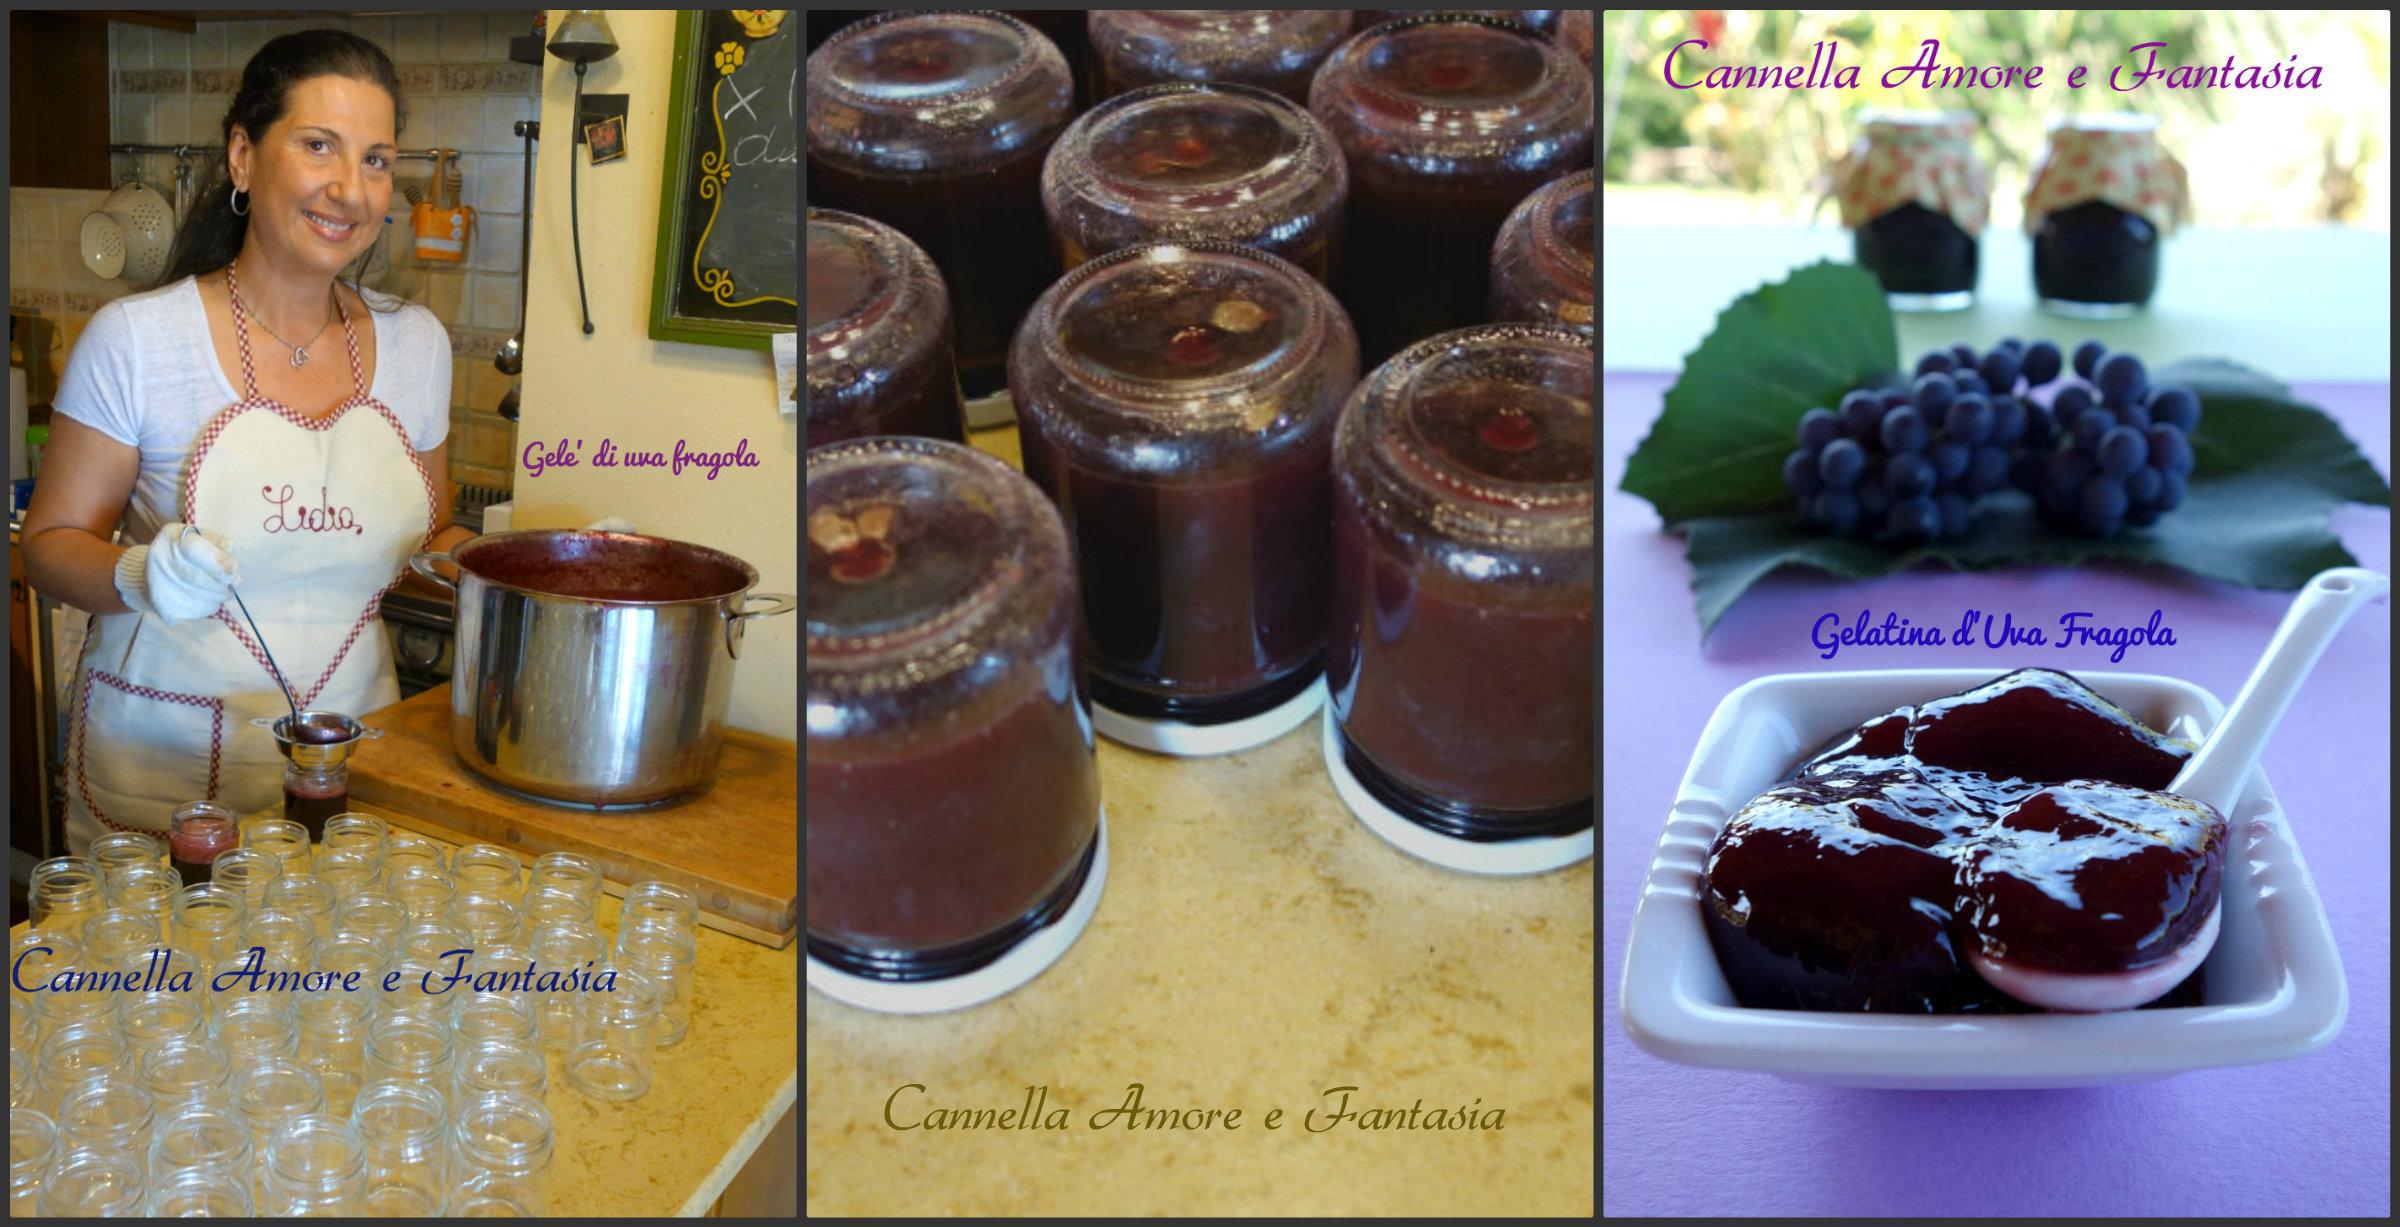 Gelatina d'uva fragola Collage finito 2